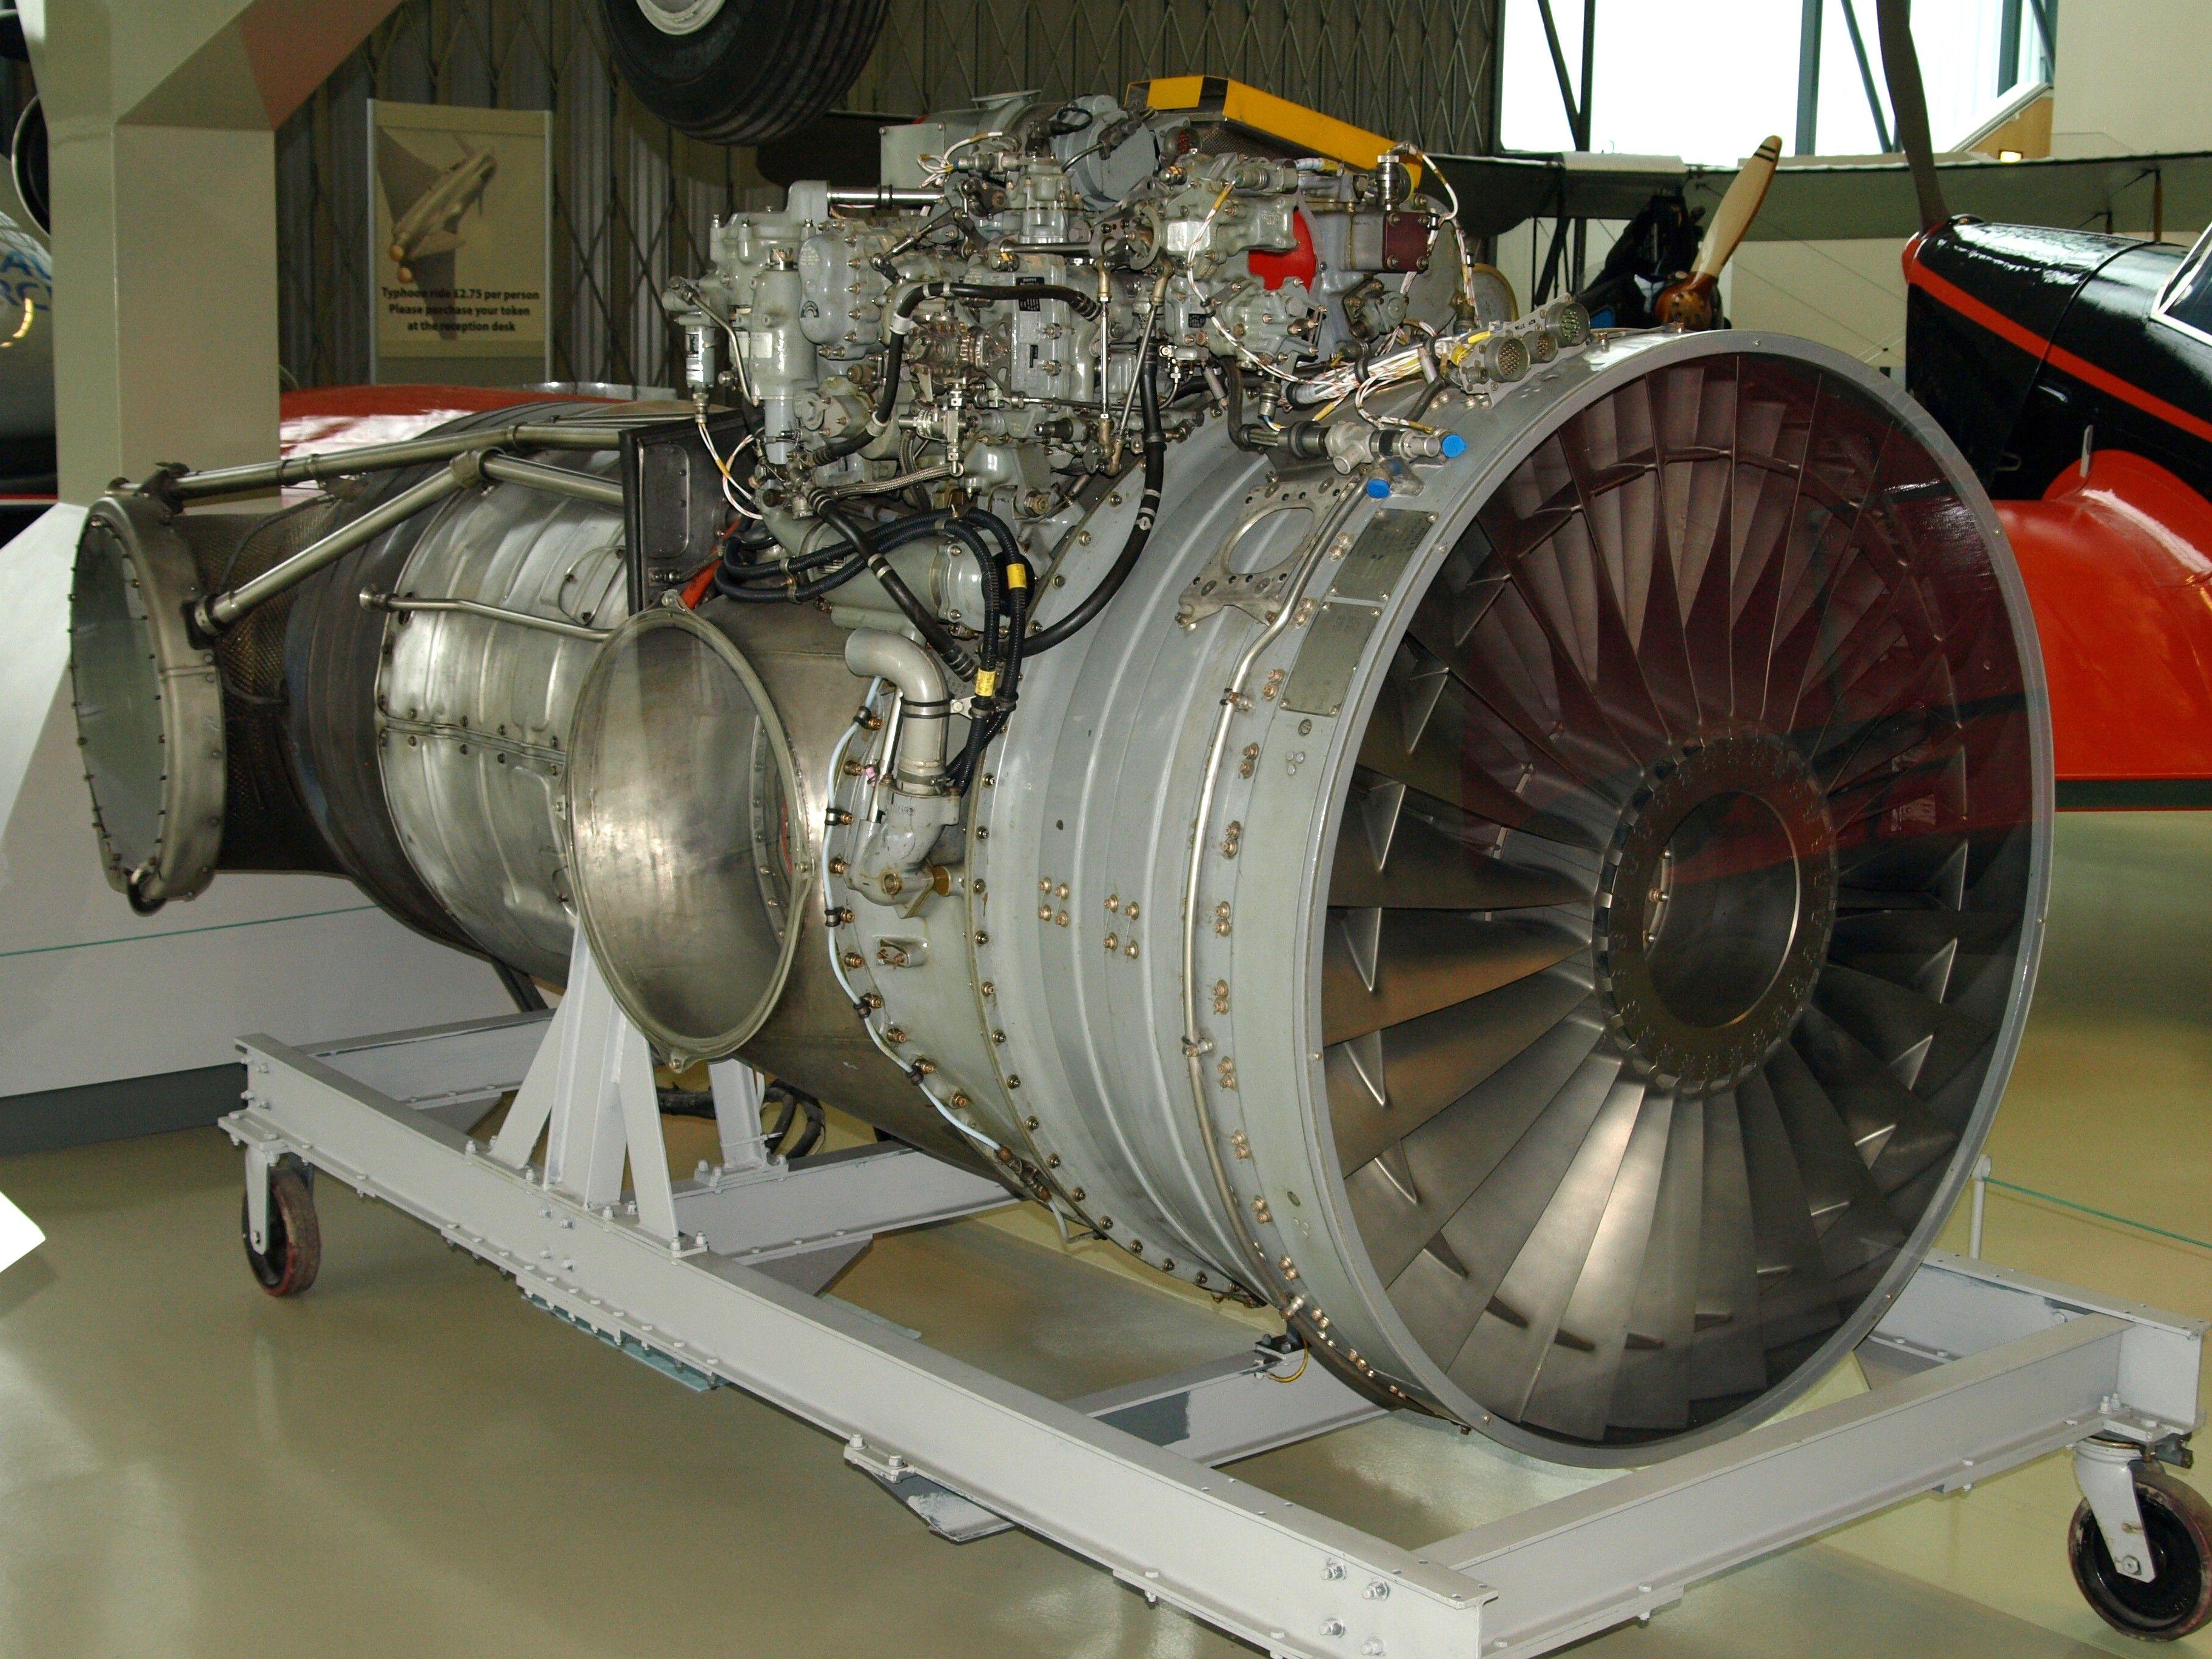 Rolls Royce Pegasus Rolls royce, Aircraft design